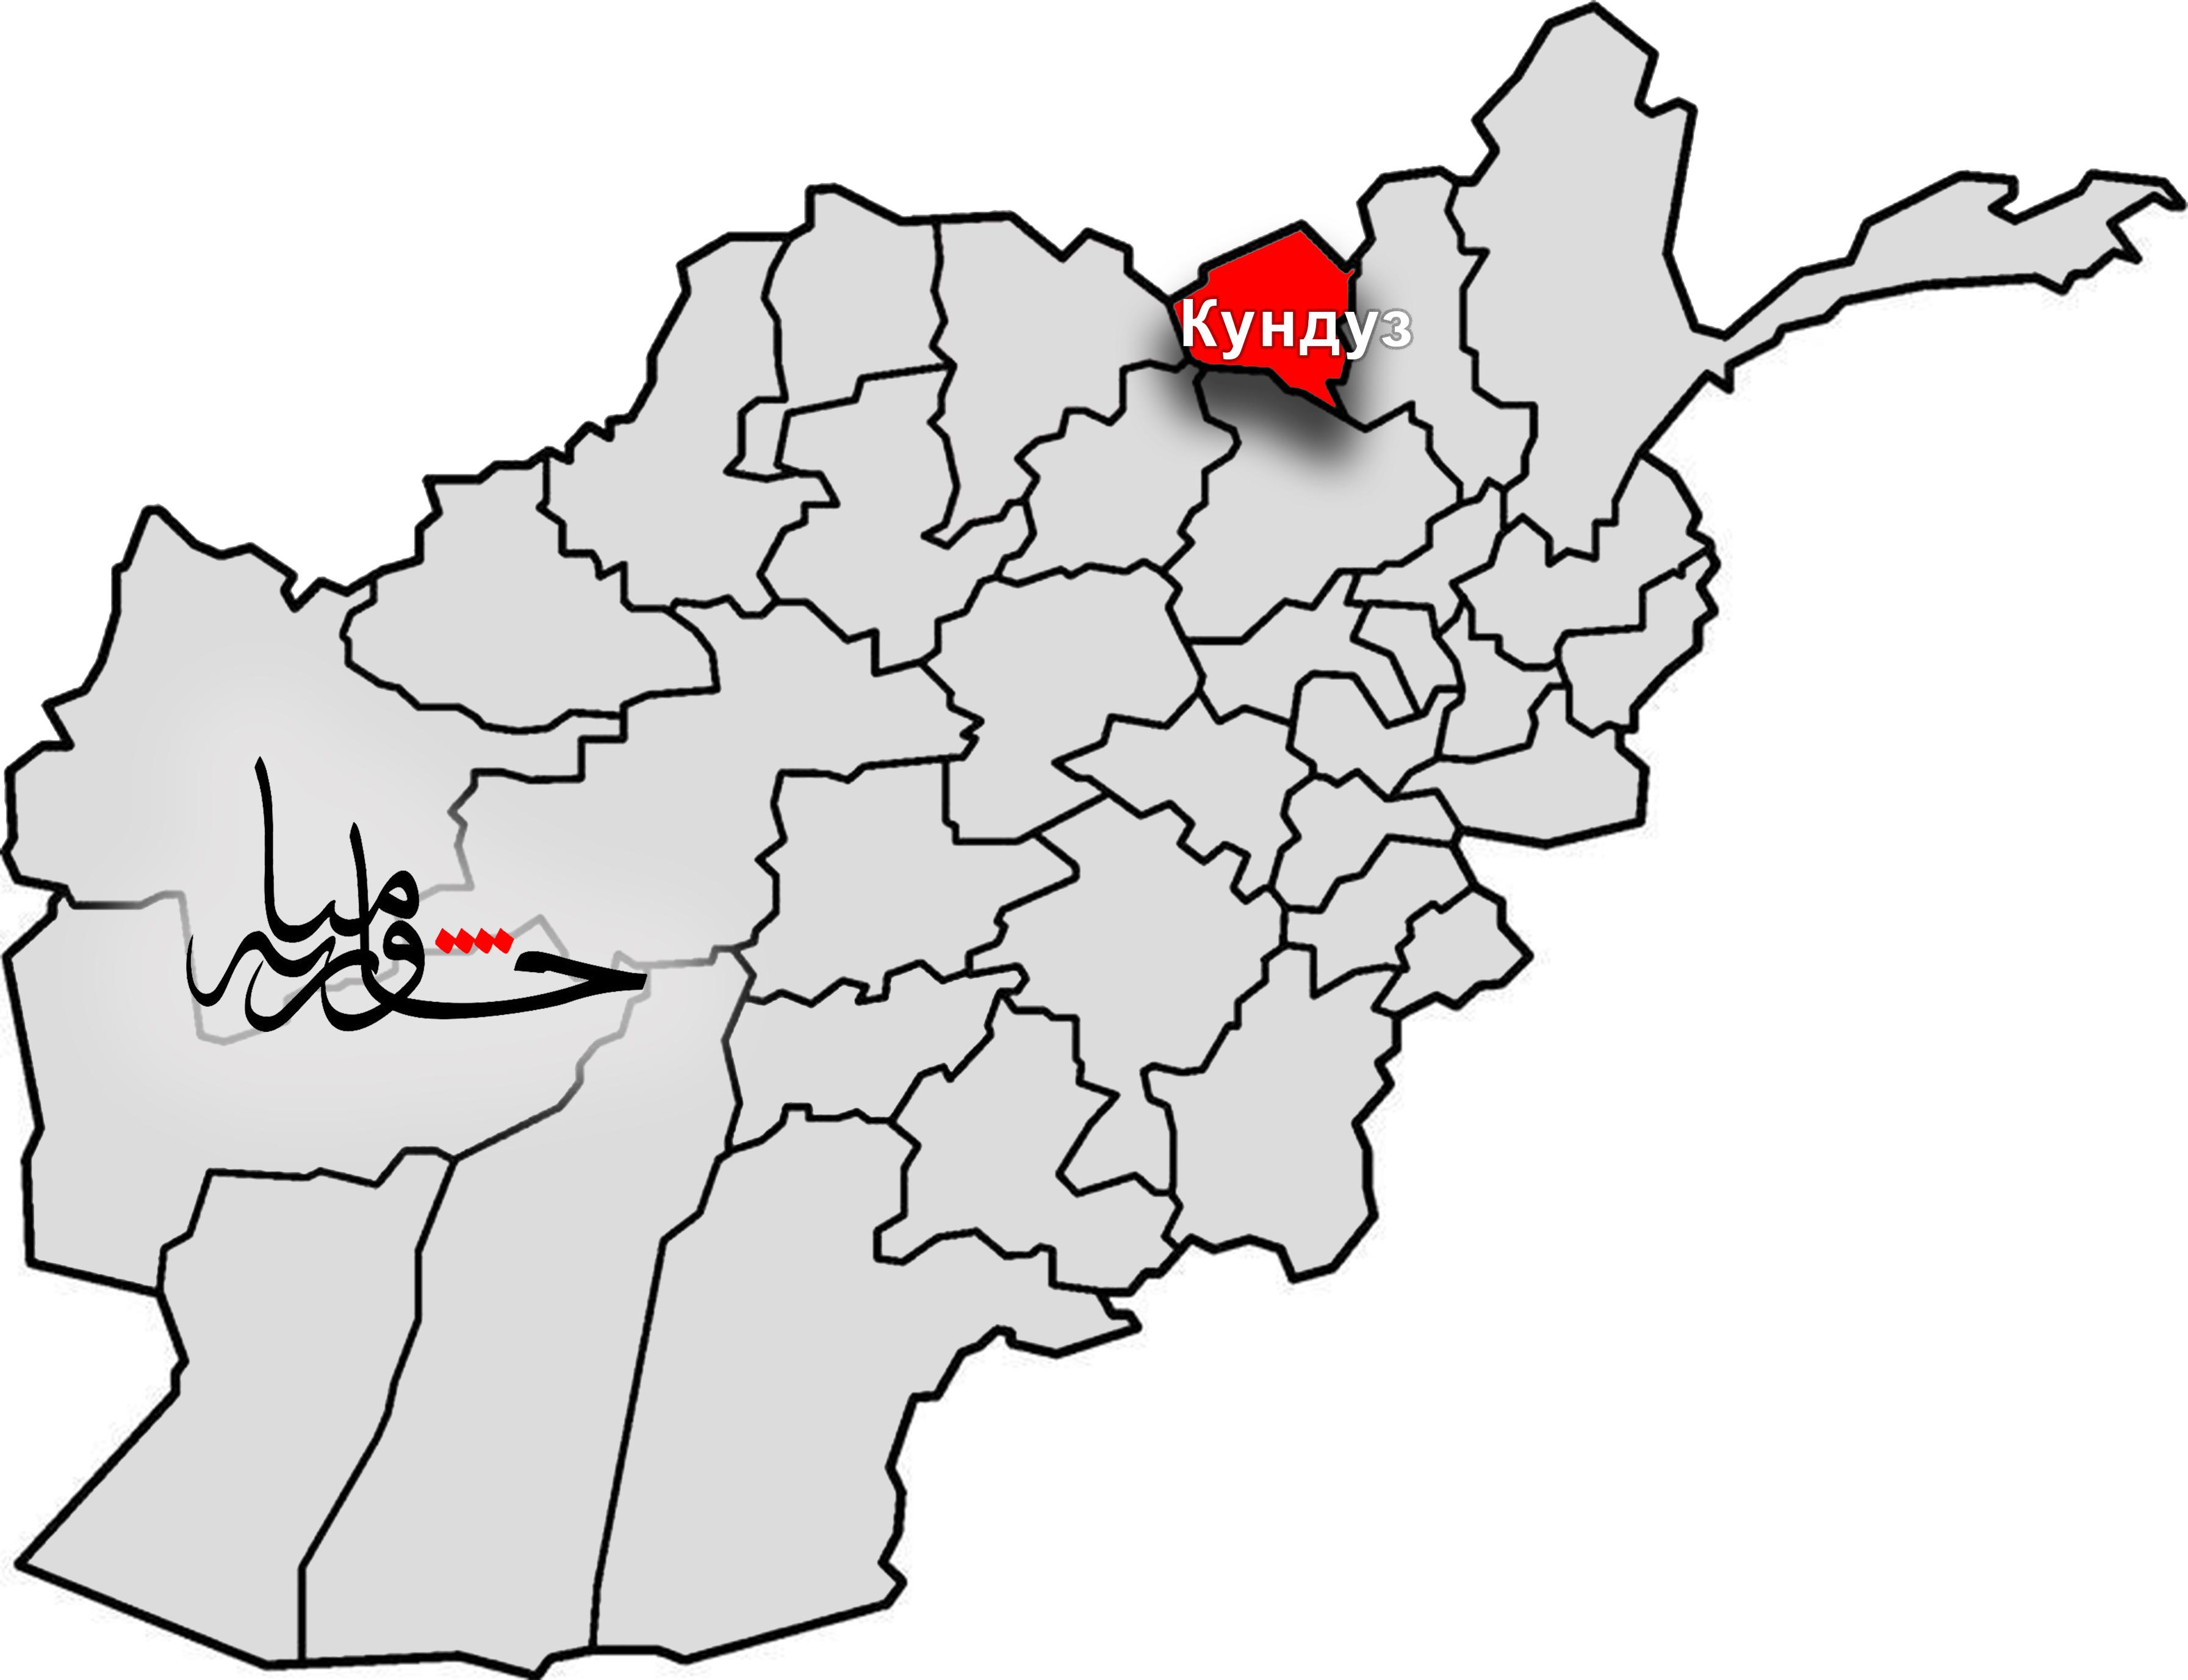 Операция спецназа завершилась в уезде Имама Сахиба провинции Кундуз